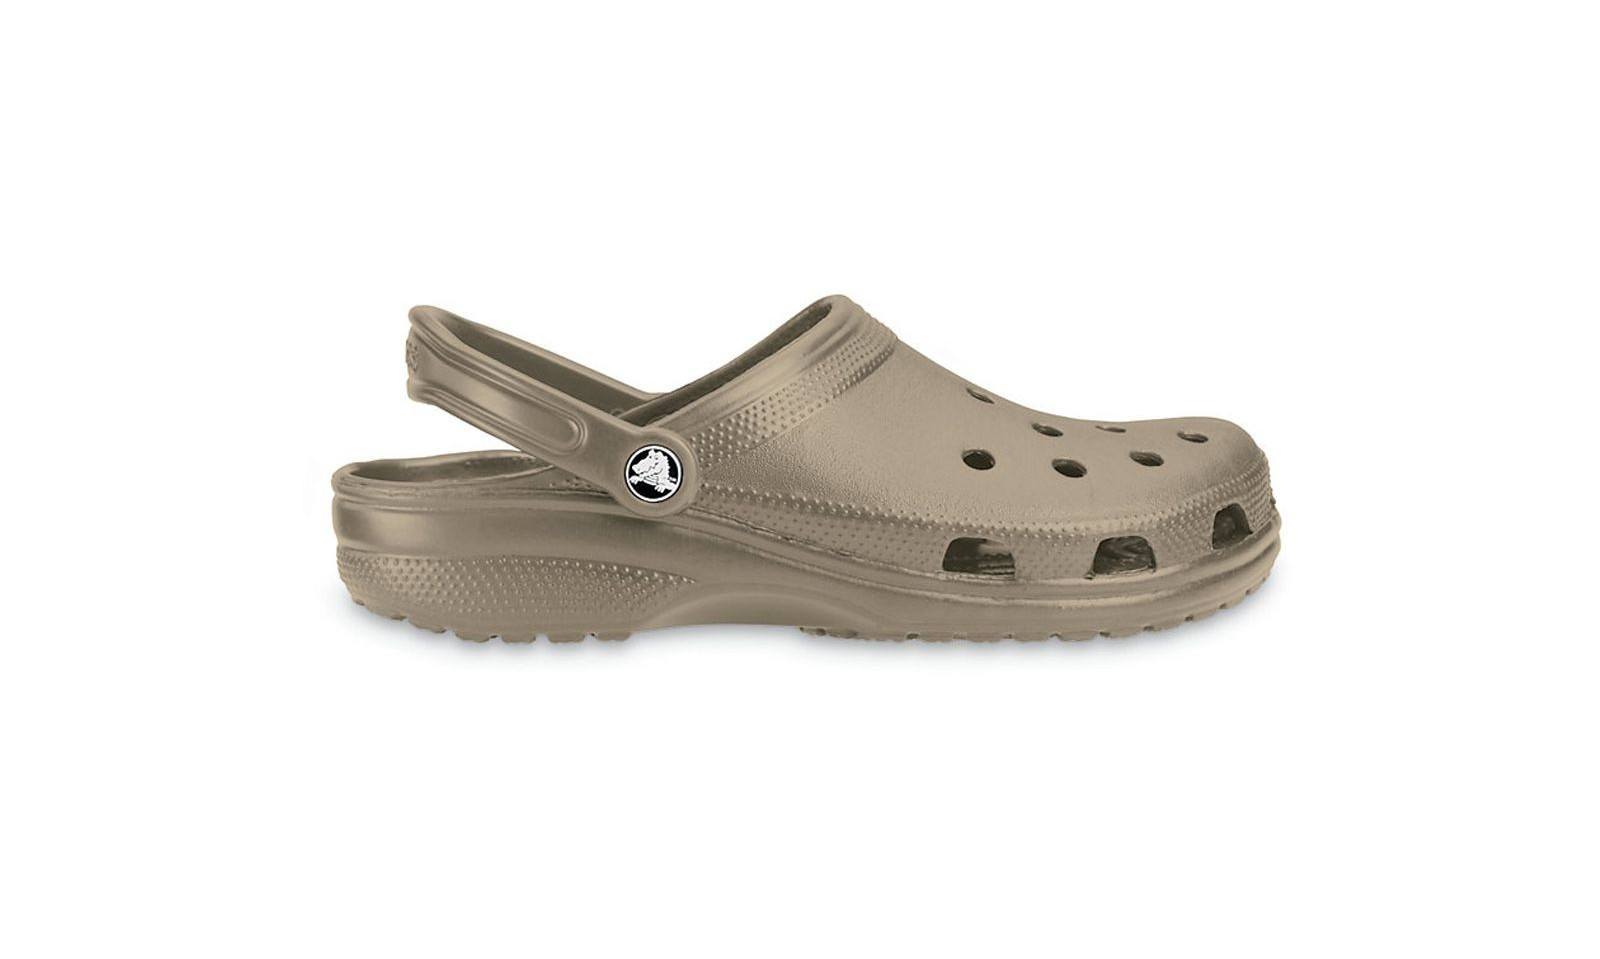 ... Sandali Crocs classic khaki zoccoli mare uomo beige ... 3e3c104ed84